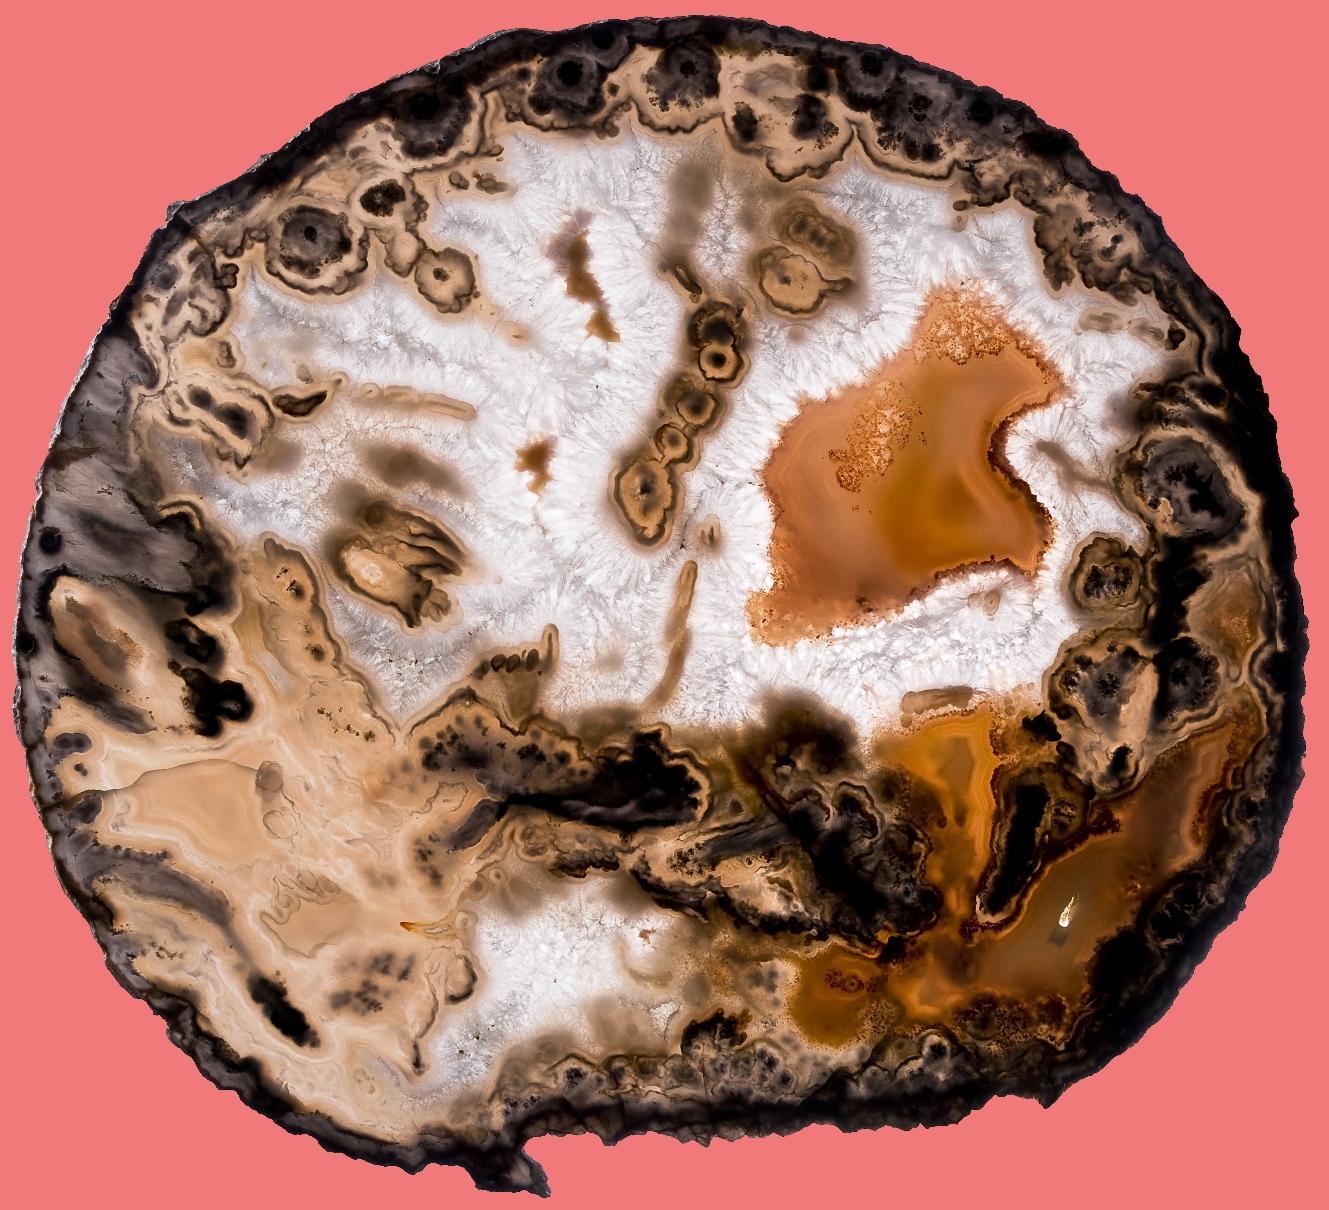 Пейзажный агат - фото и свойства камня агат